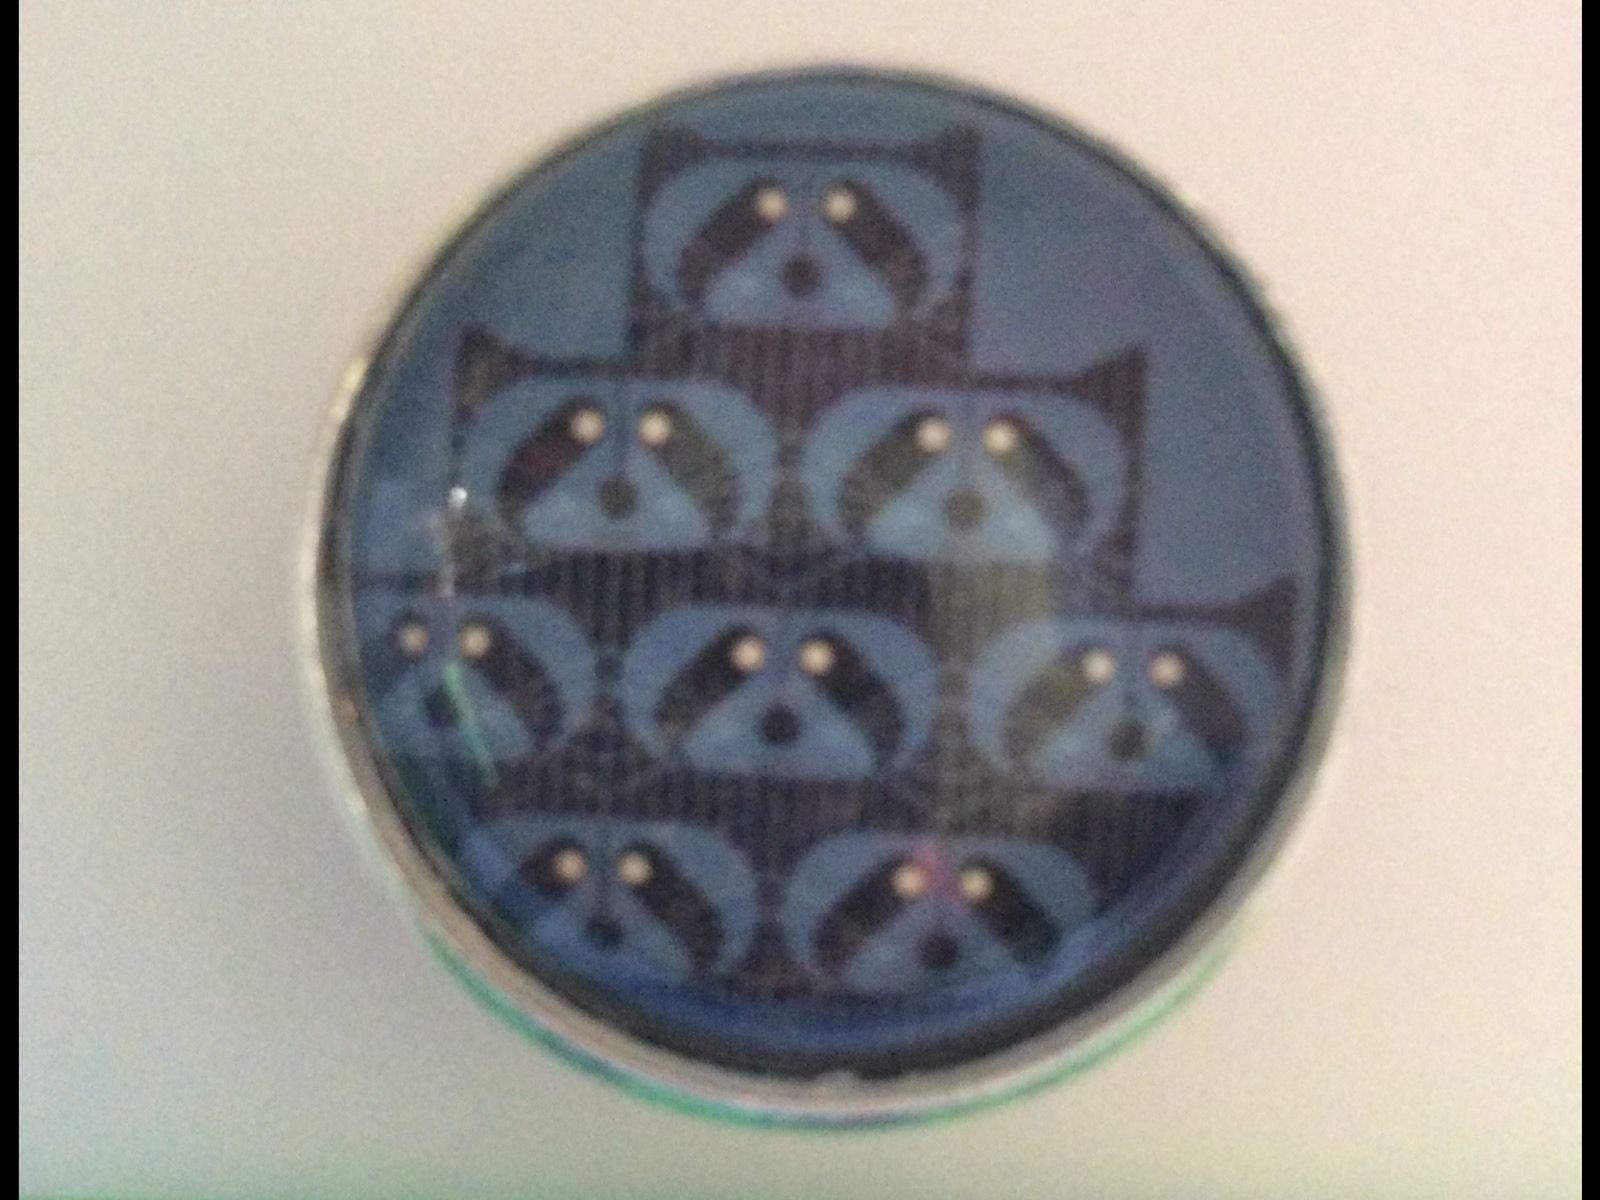 Charley Harper Raccoon Varmint Sewing Button 1 Mid Century Mod Charles AK17